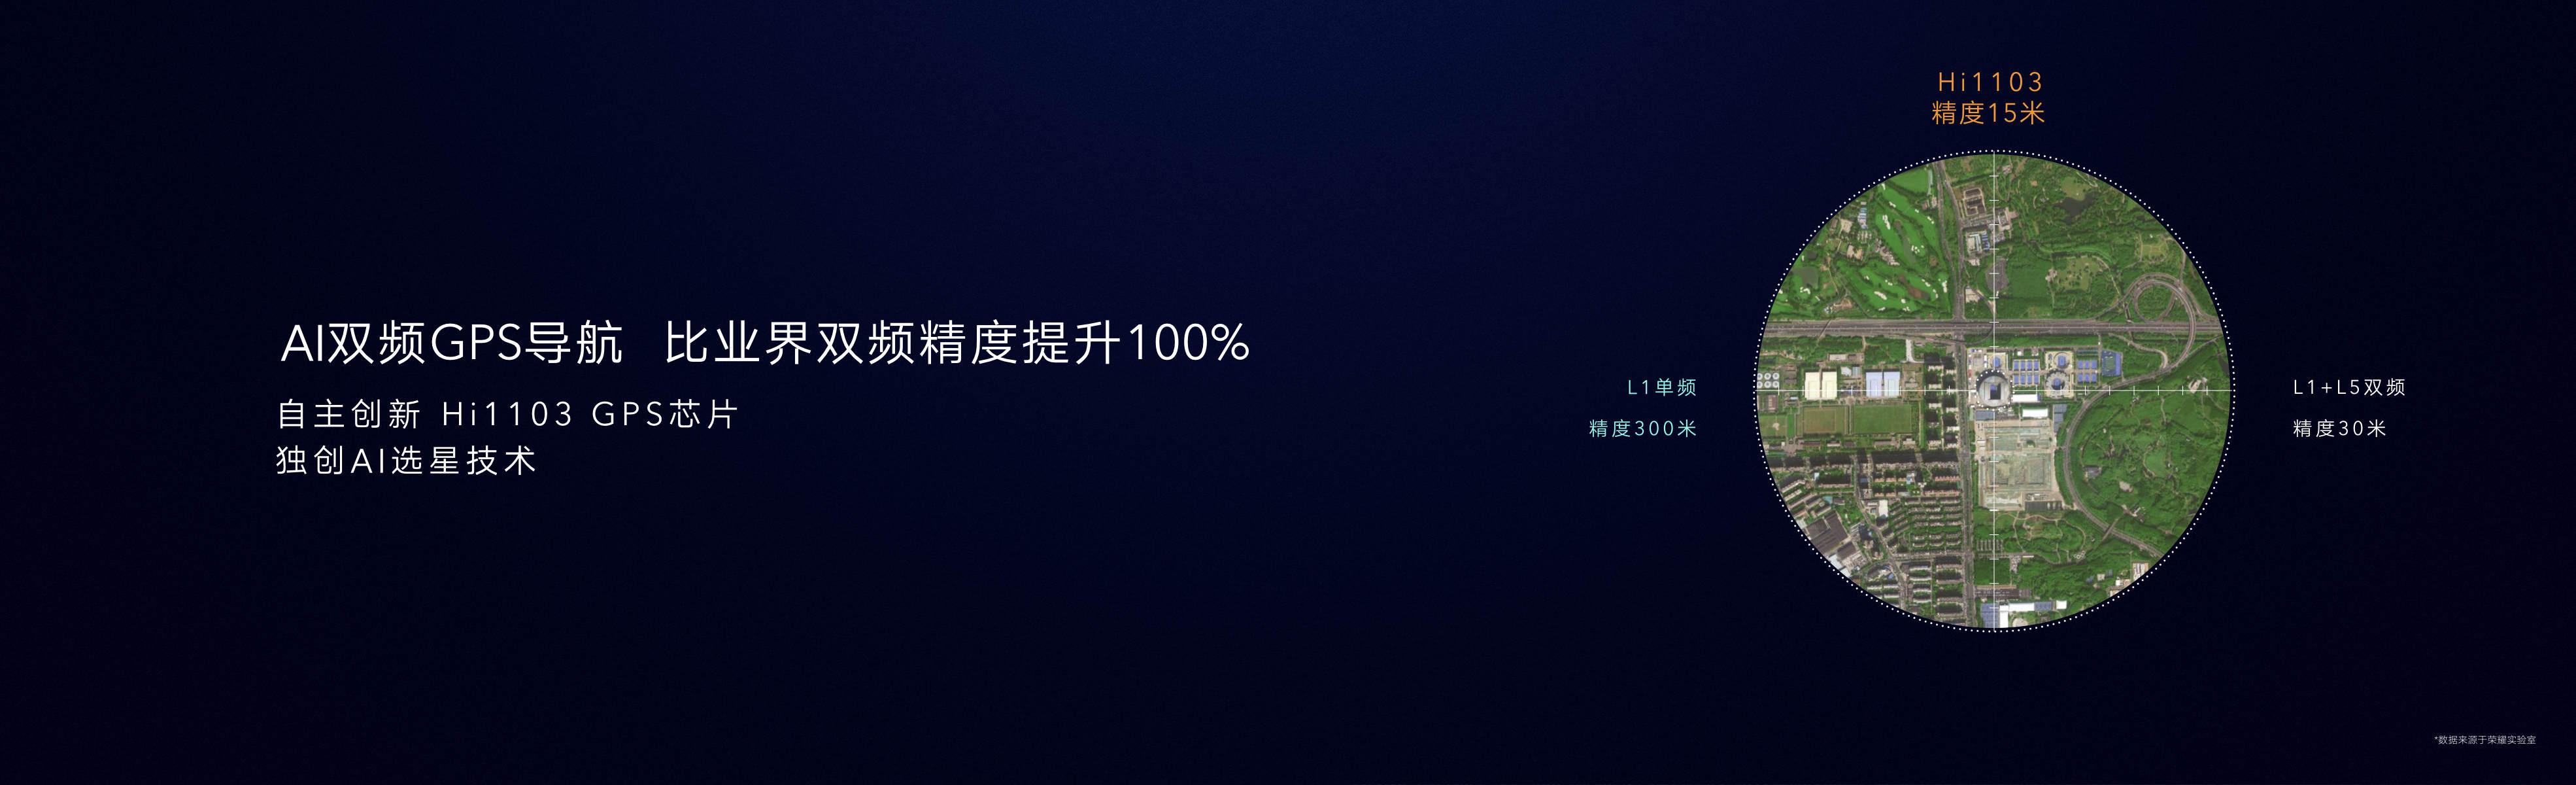 TONY发布会胶片1031  1400 封板.068_副本.jpg